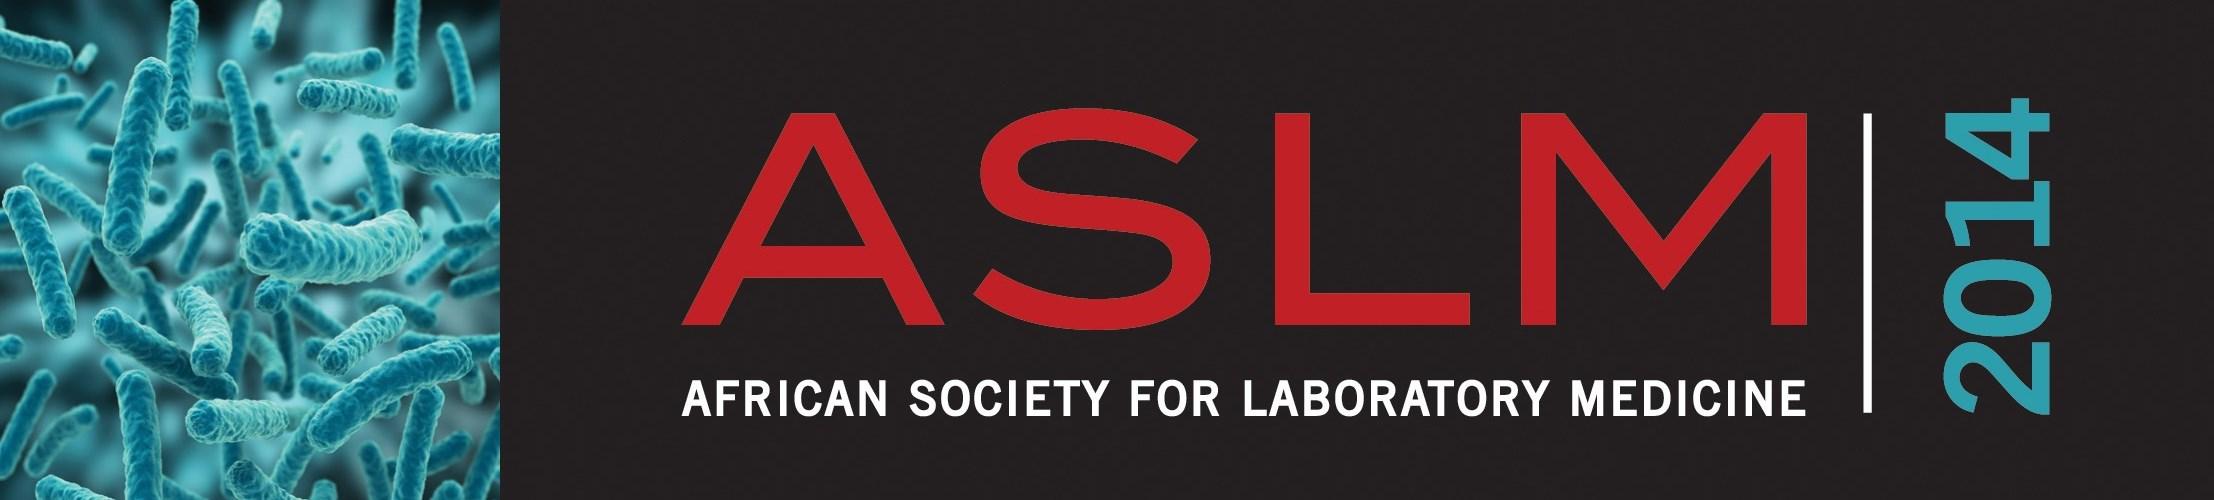 UNAIDS, ASLM and Partners Launch Initiative to Improve HIV Diagnostics